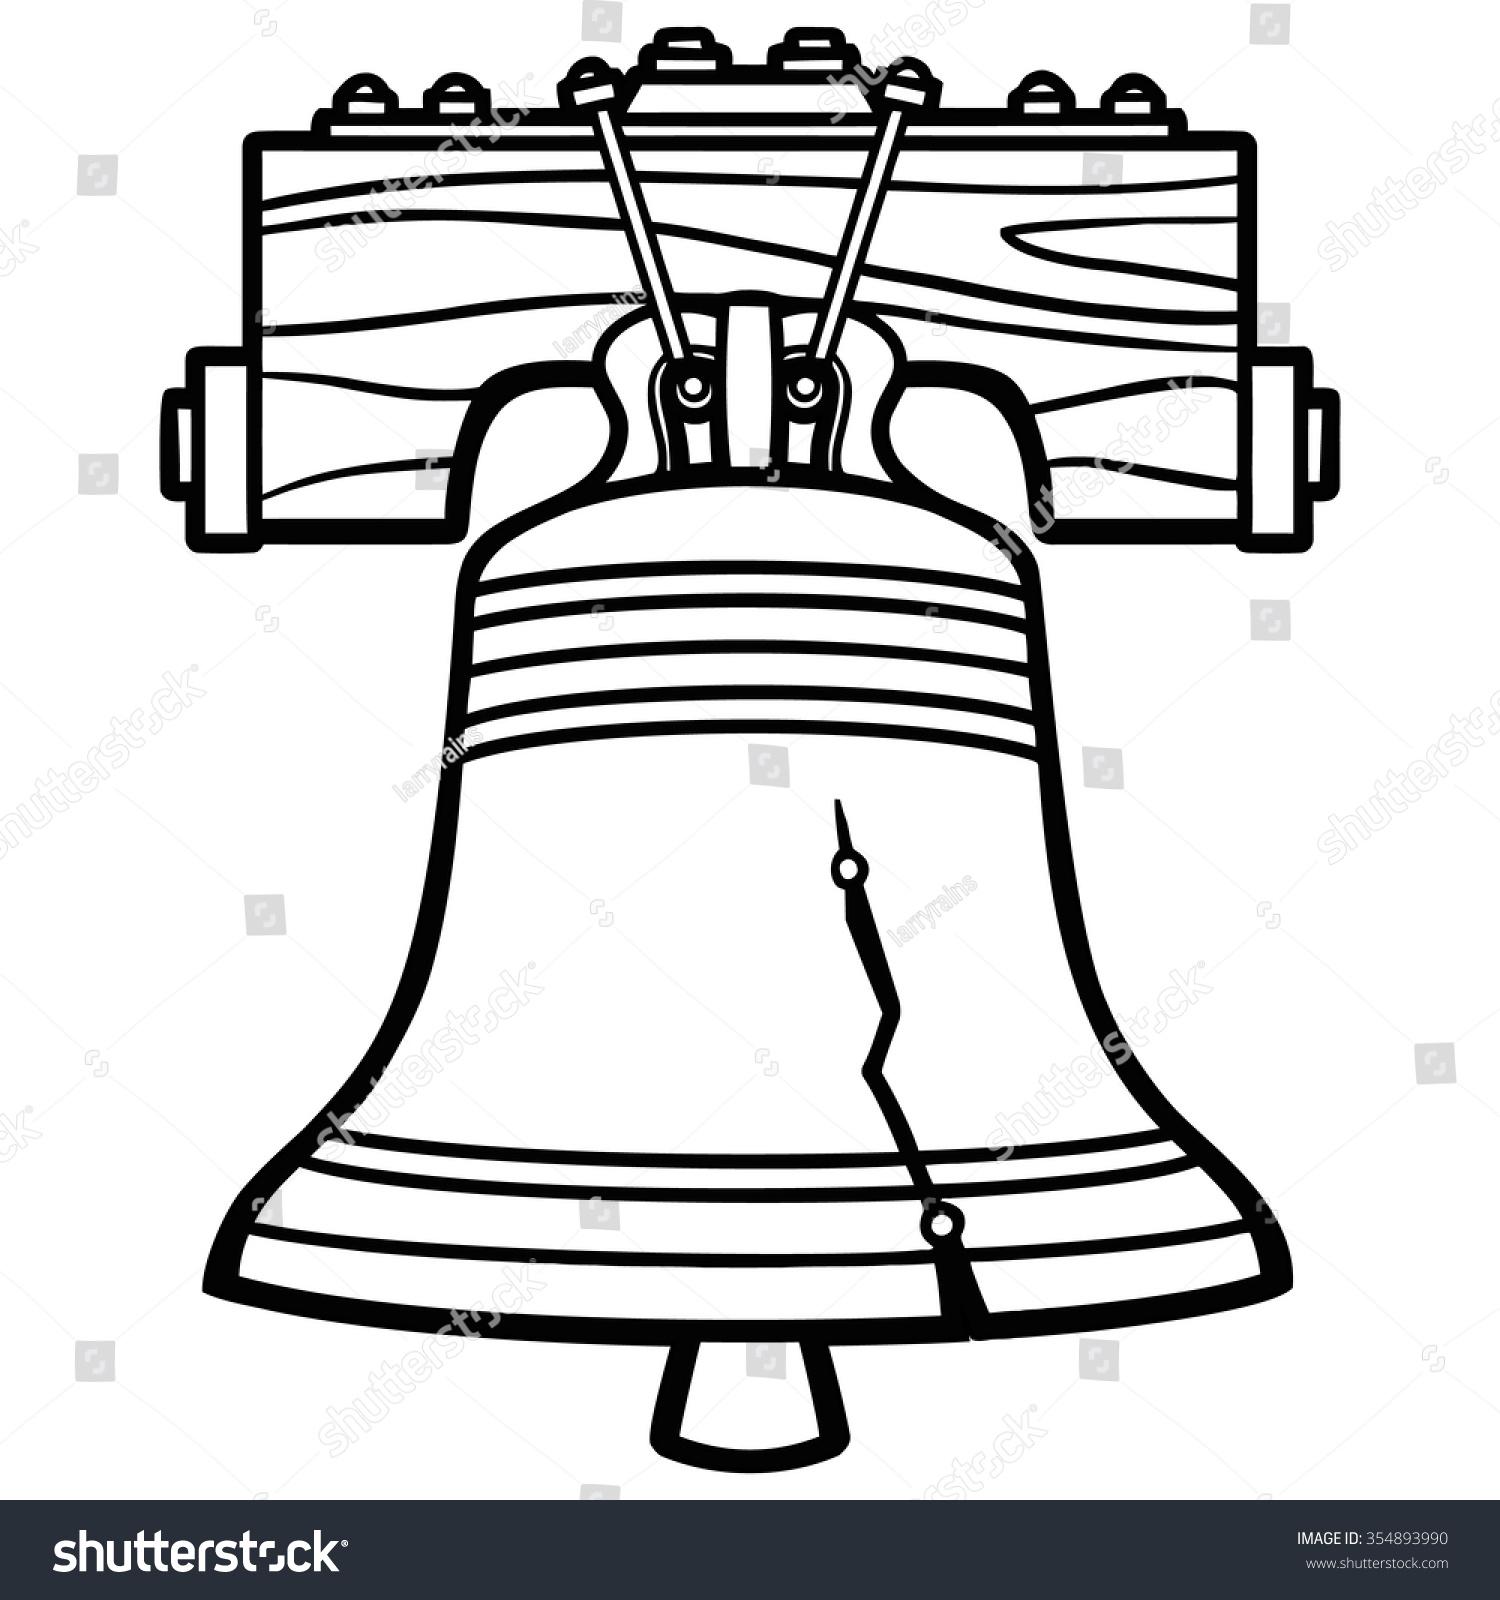 Liberty Bell Illustration Stock Vector 354893990 - Shutterstock